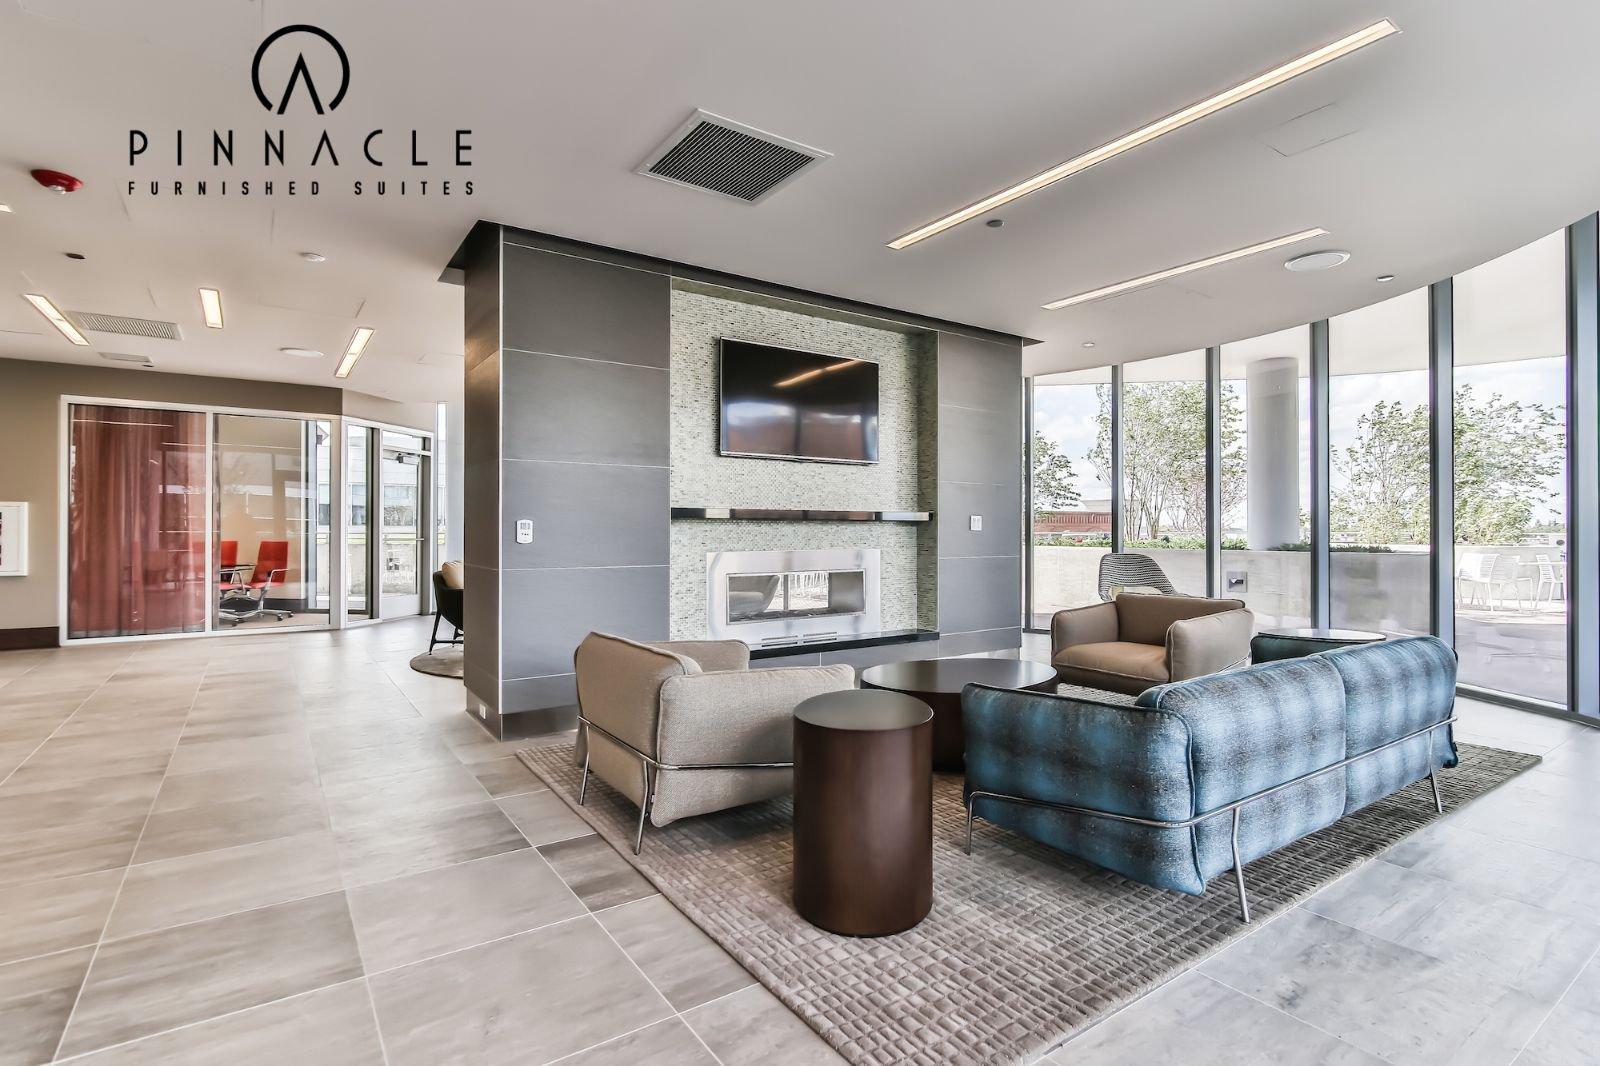 lincoln park new city apartments corporate housing pfsuites. Black Bedroom Furniture Sets. Home Design Ideas